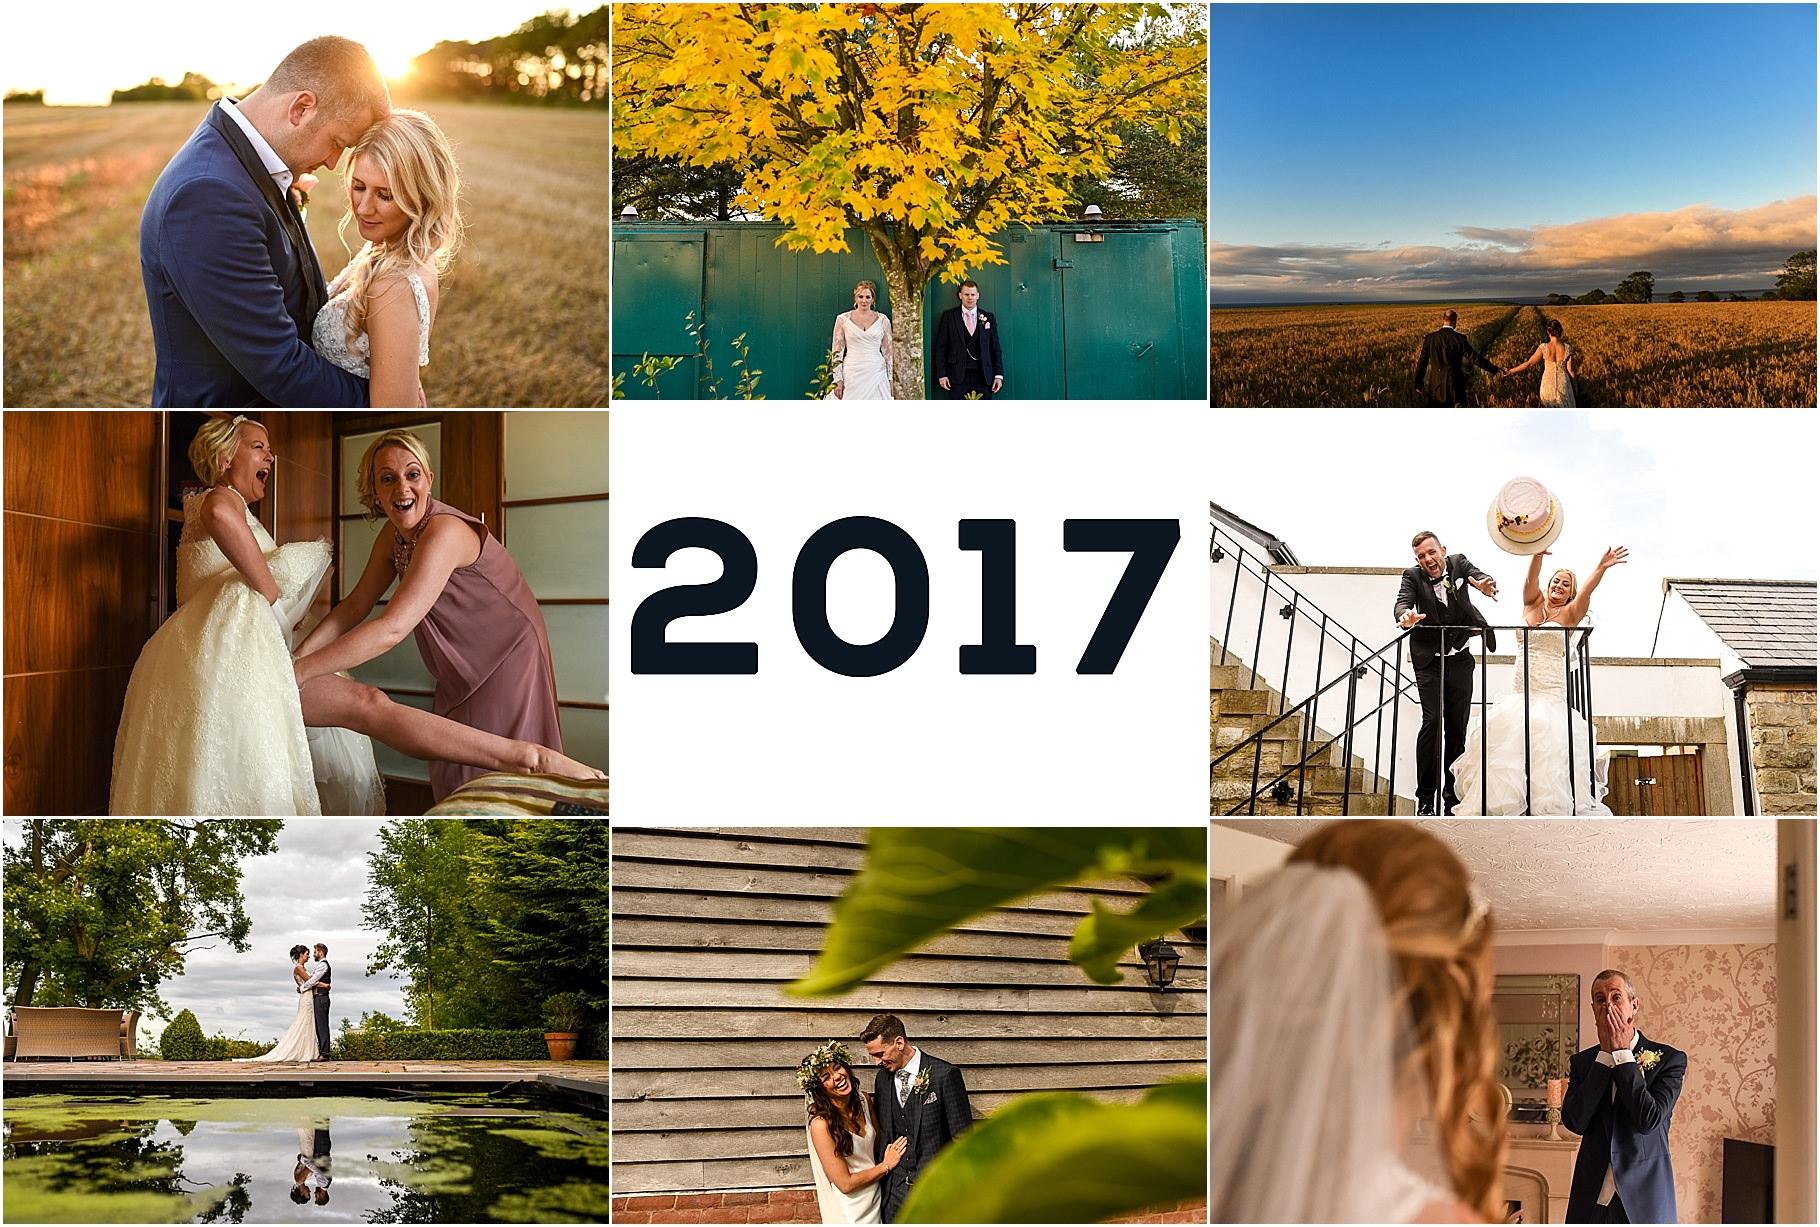 dan-wootton-photography-2017-weddings-header.jpg